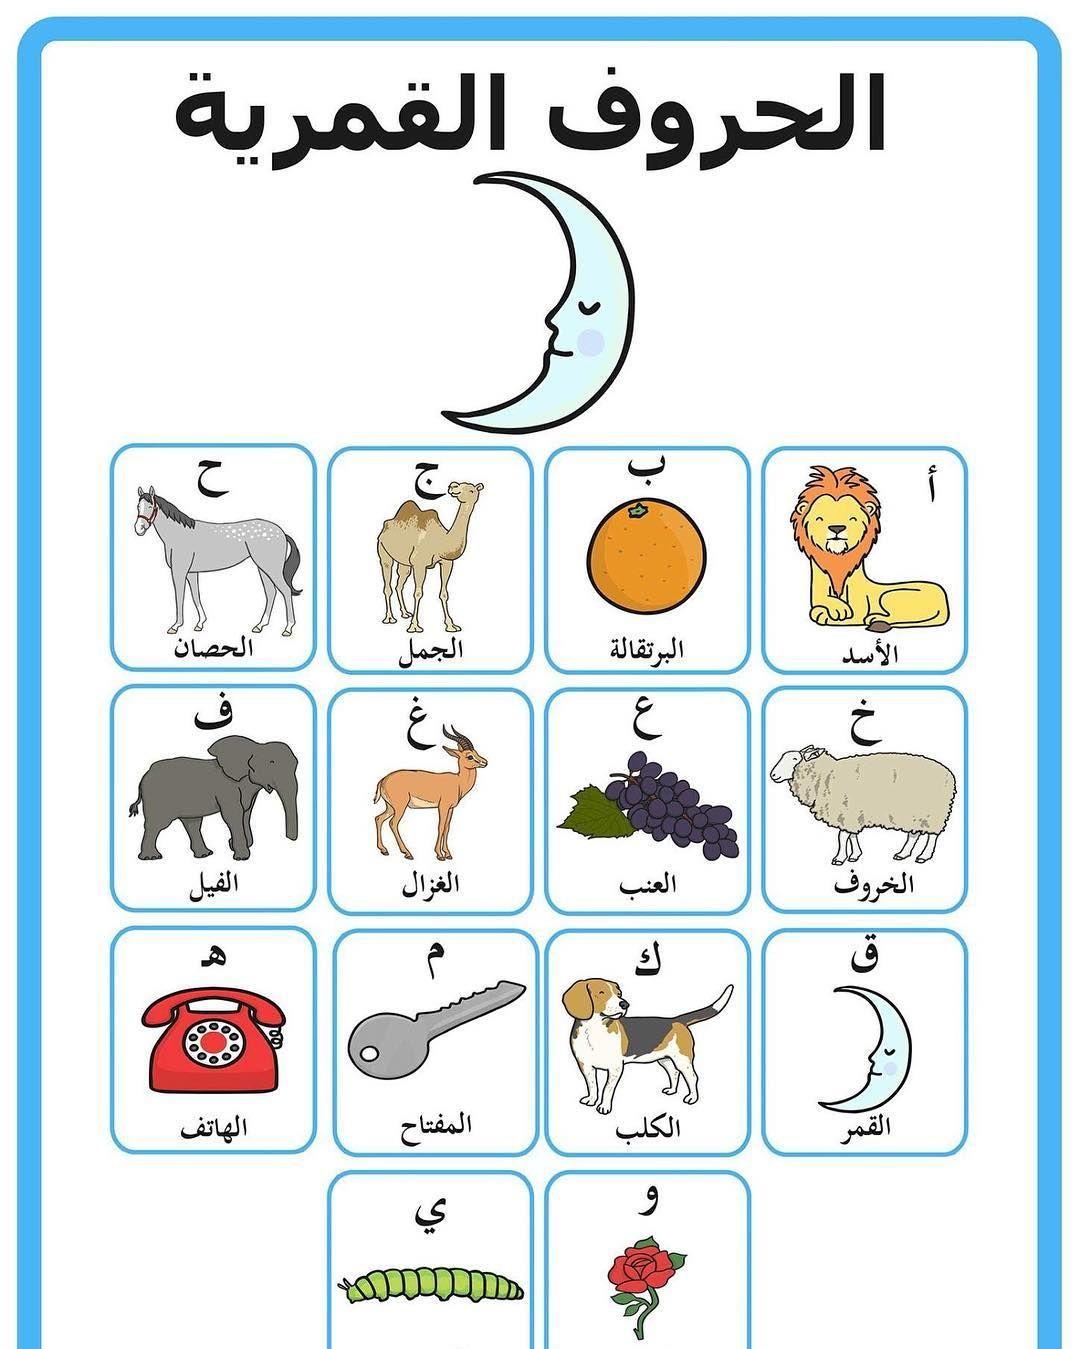 59 Likerklikk 1 Kommentarer المنهج الوطني الجديد Ykuwait Net2 Pa Instagram هيا نتعرف على الحروف القمرية Learning Arabic Arabic Kids Arabic Lessons